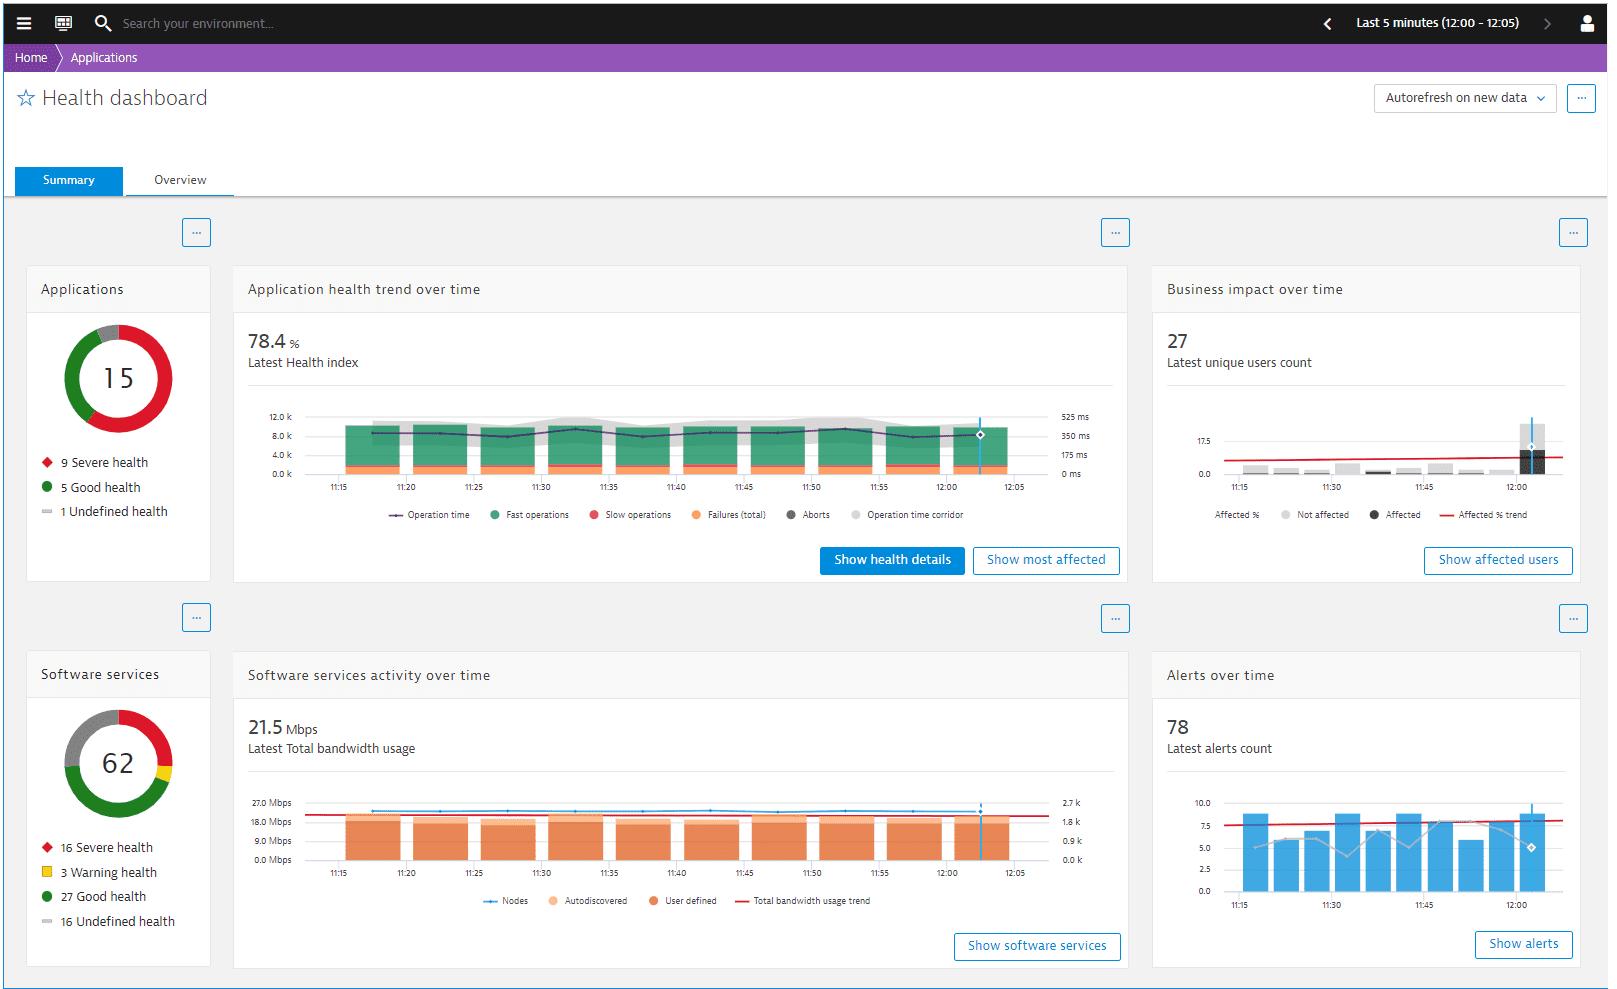 NAM: Health dashboard: Summary